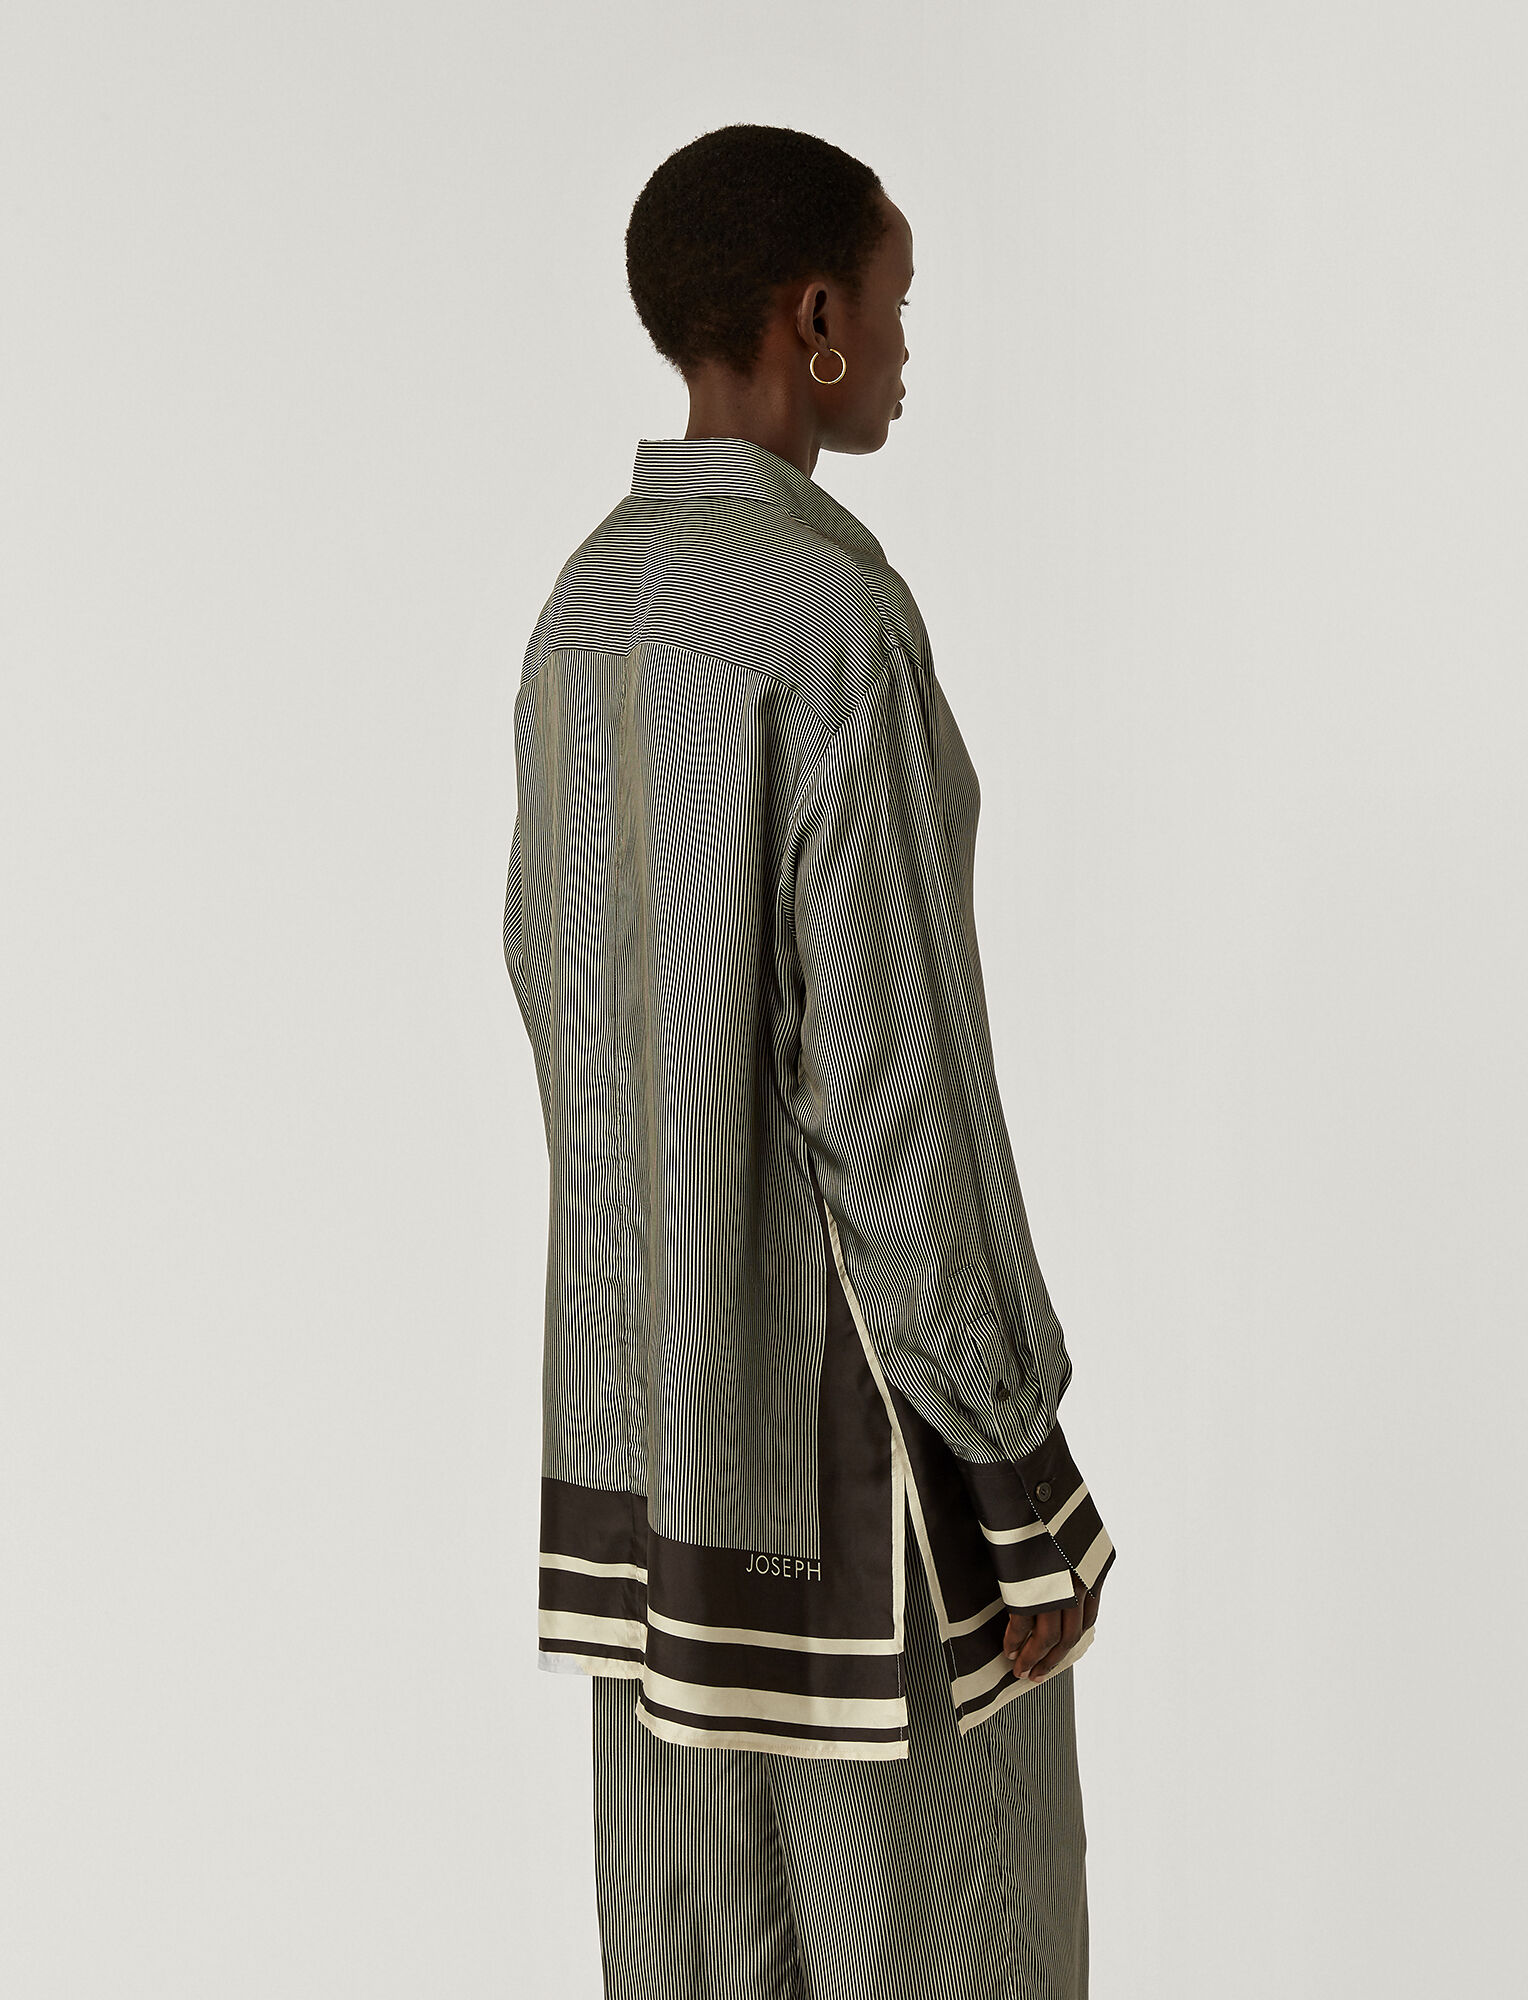 Joseph, Scarf Print Bawson Blouse, in BLACK/PORCELAIN